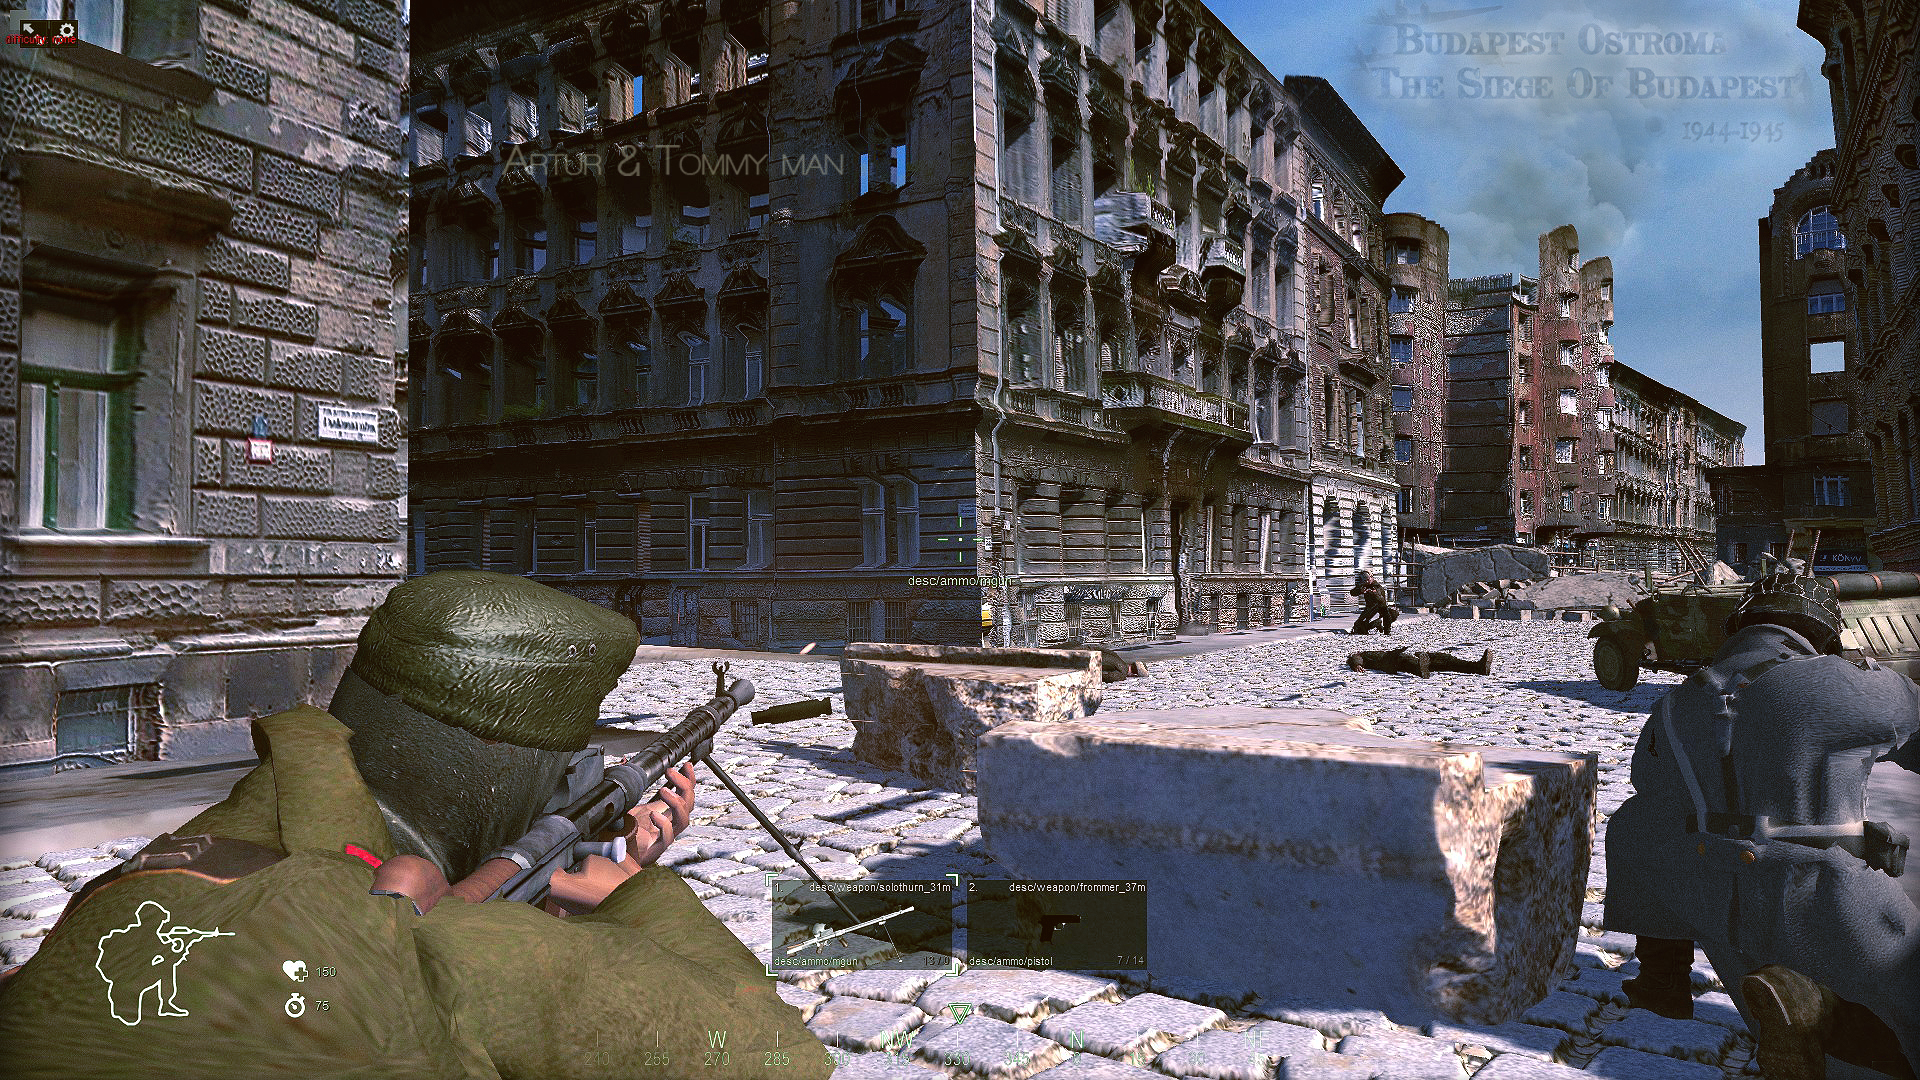 Budapest utcai harc jatek, mod